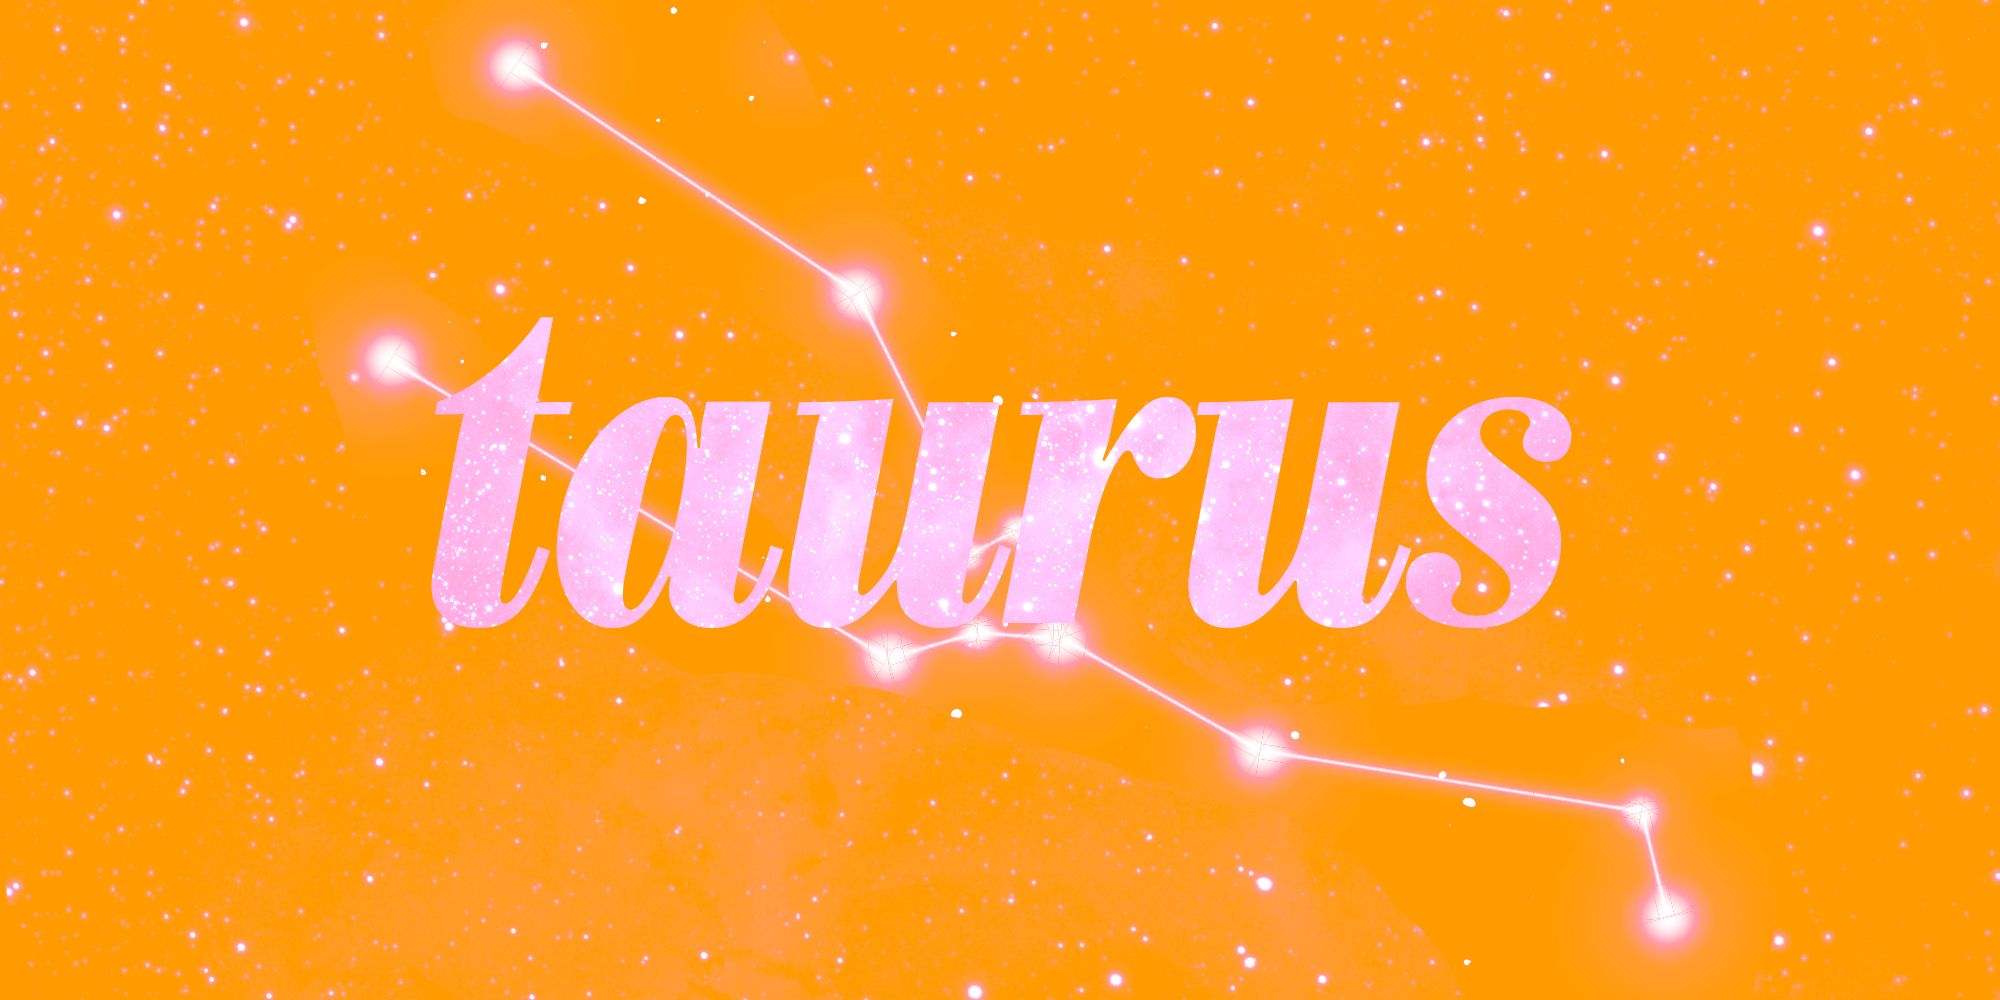 cosmopolitan horoscope february 25